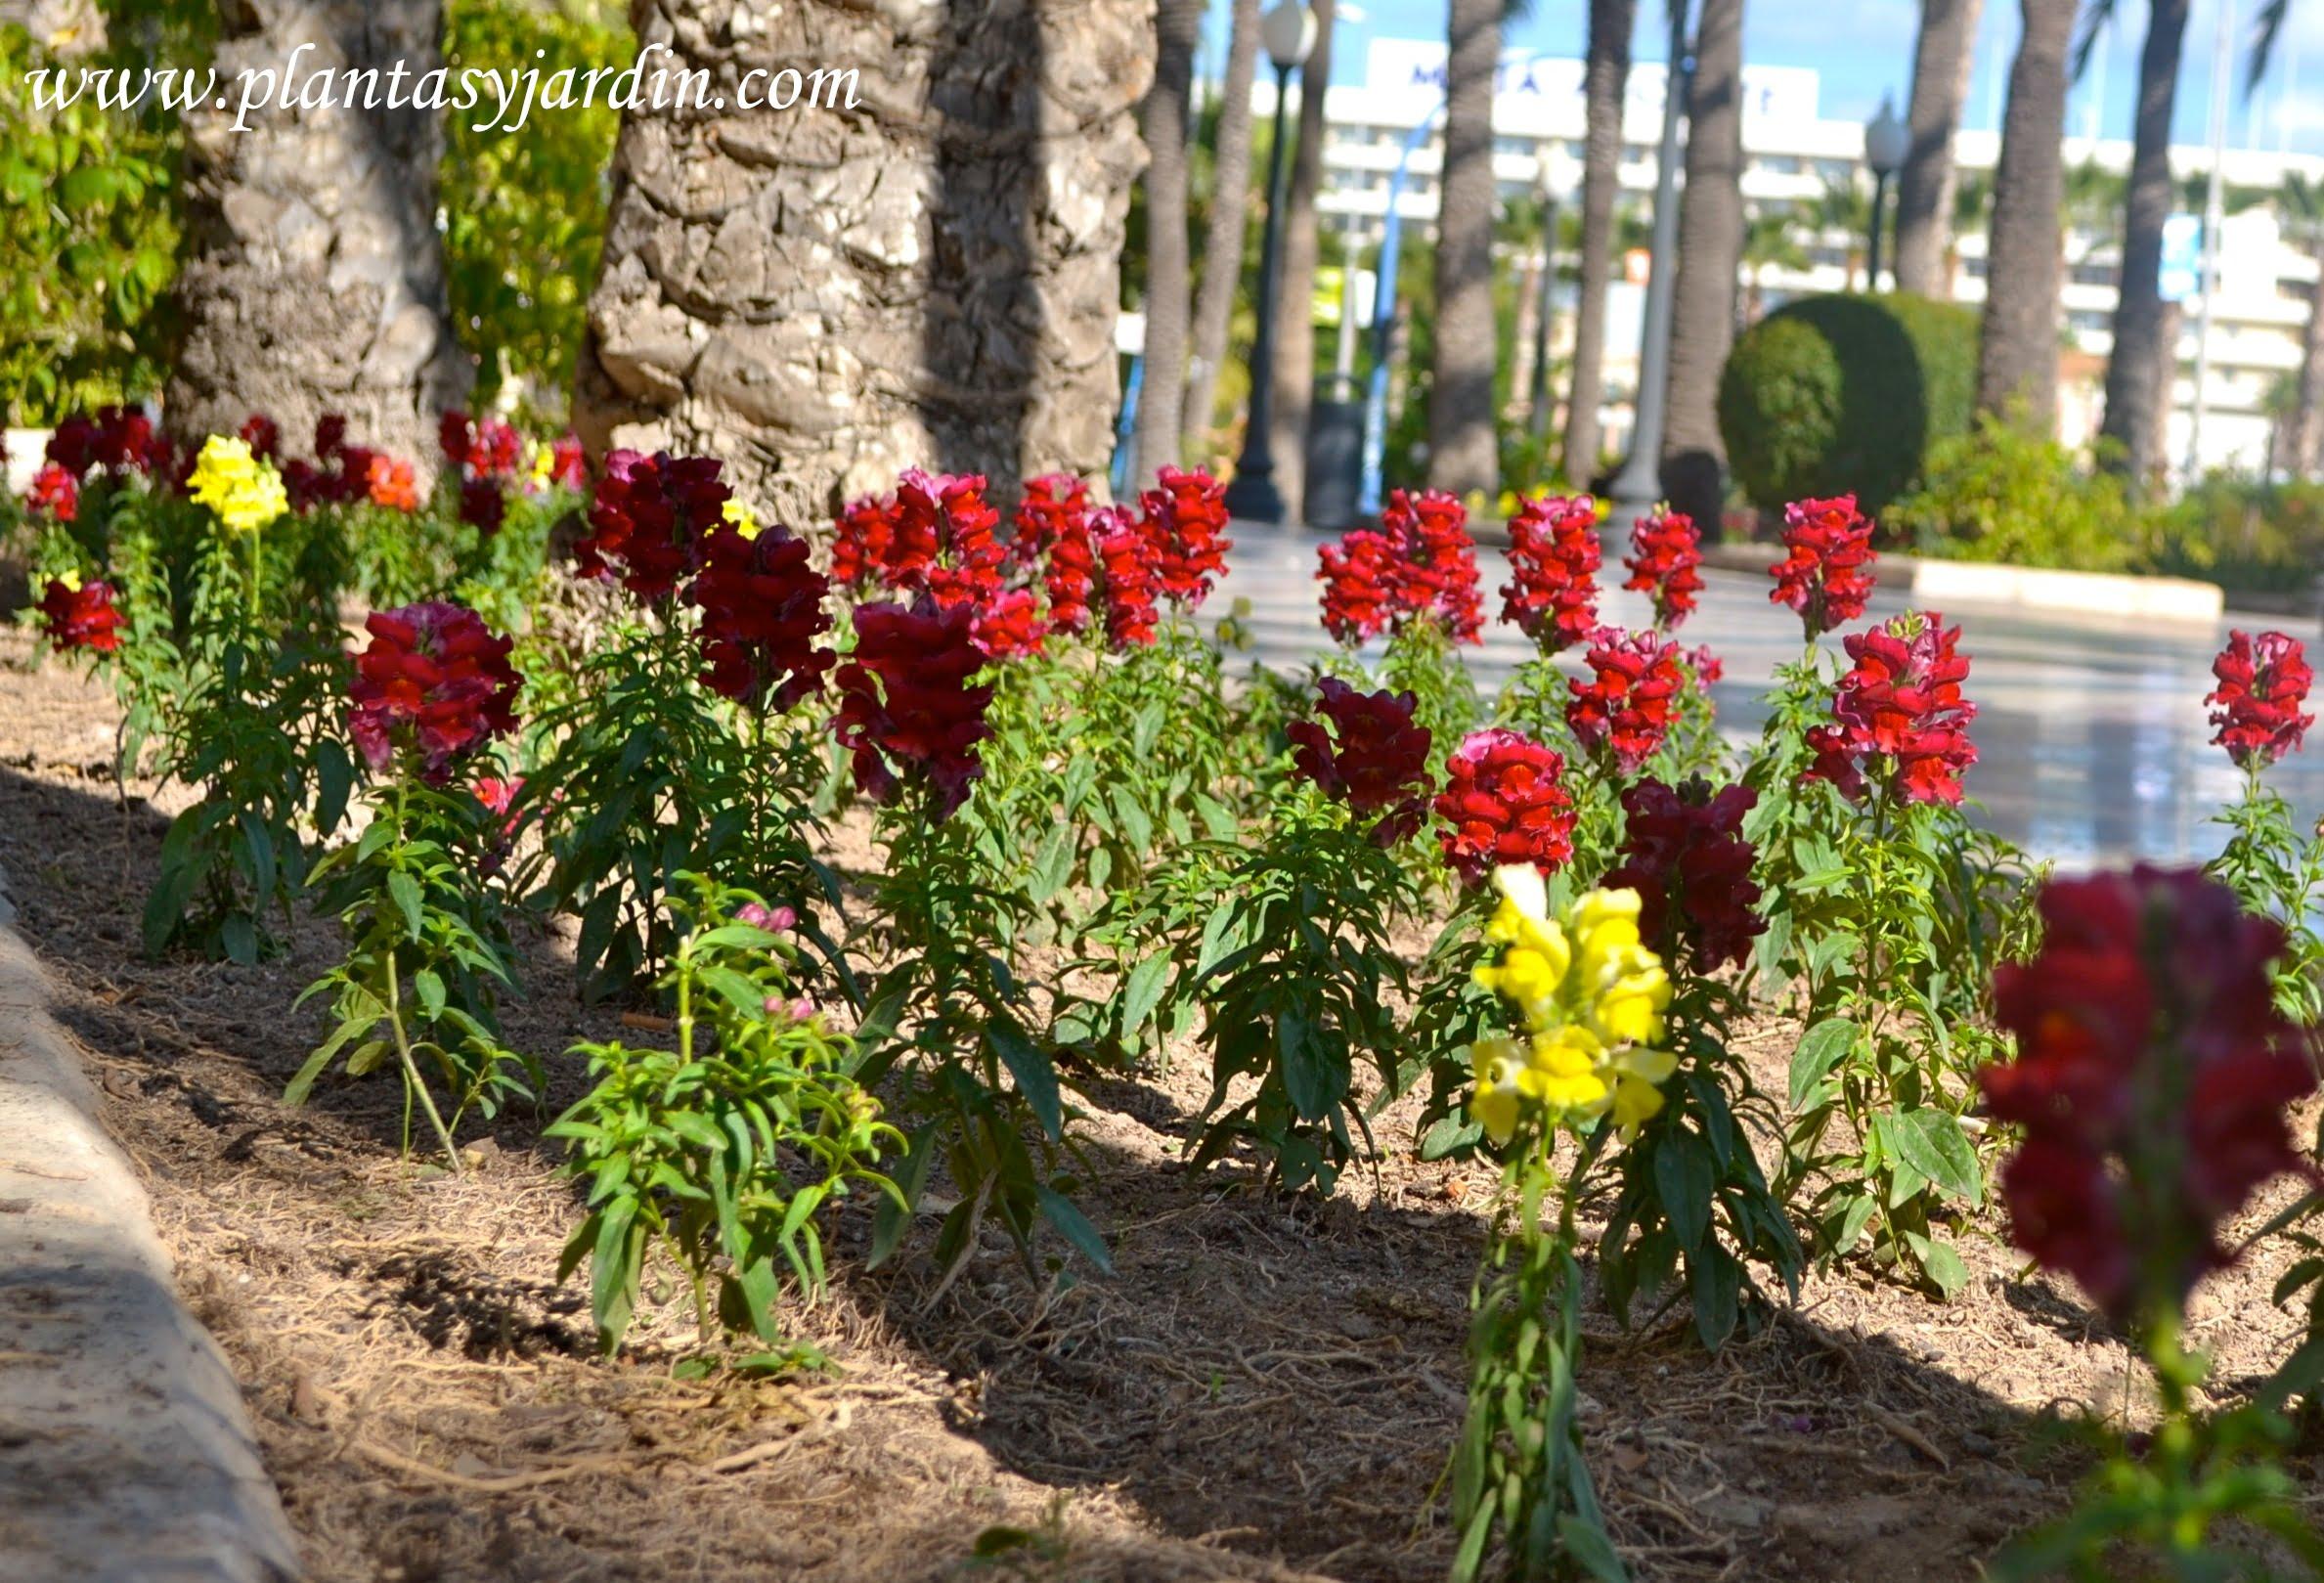 Antirrhinum majus rojos y amarillos